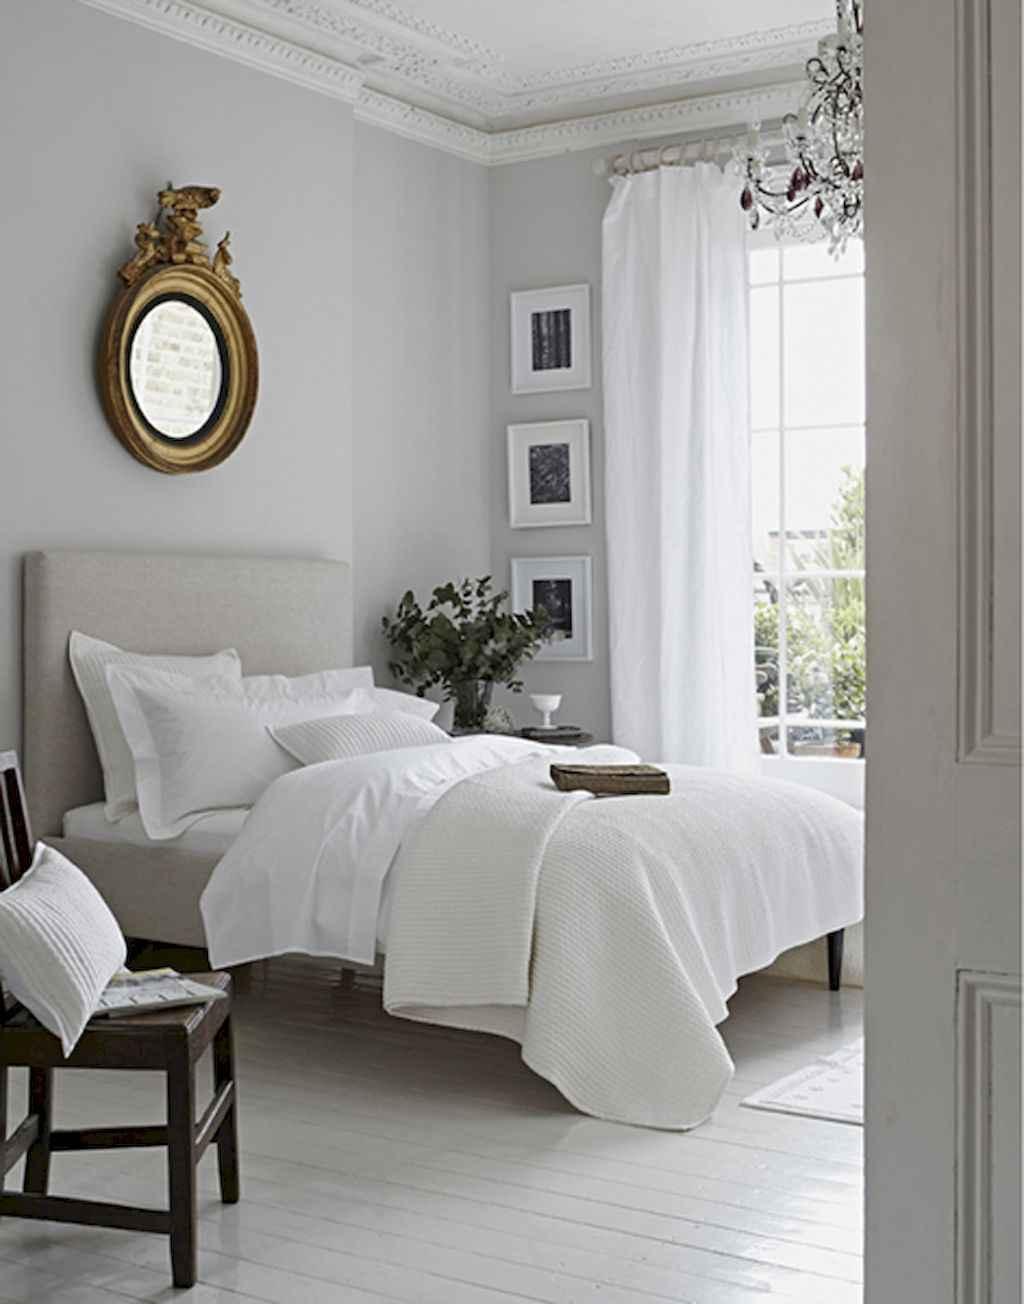 100 Stunning Farmhouse Master Bedroom Decor Ideas (53)